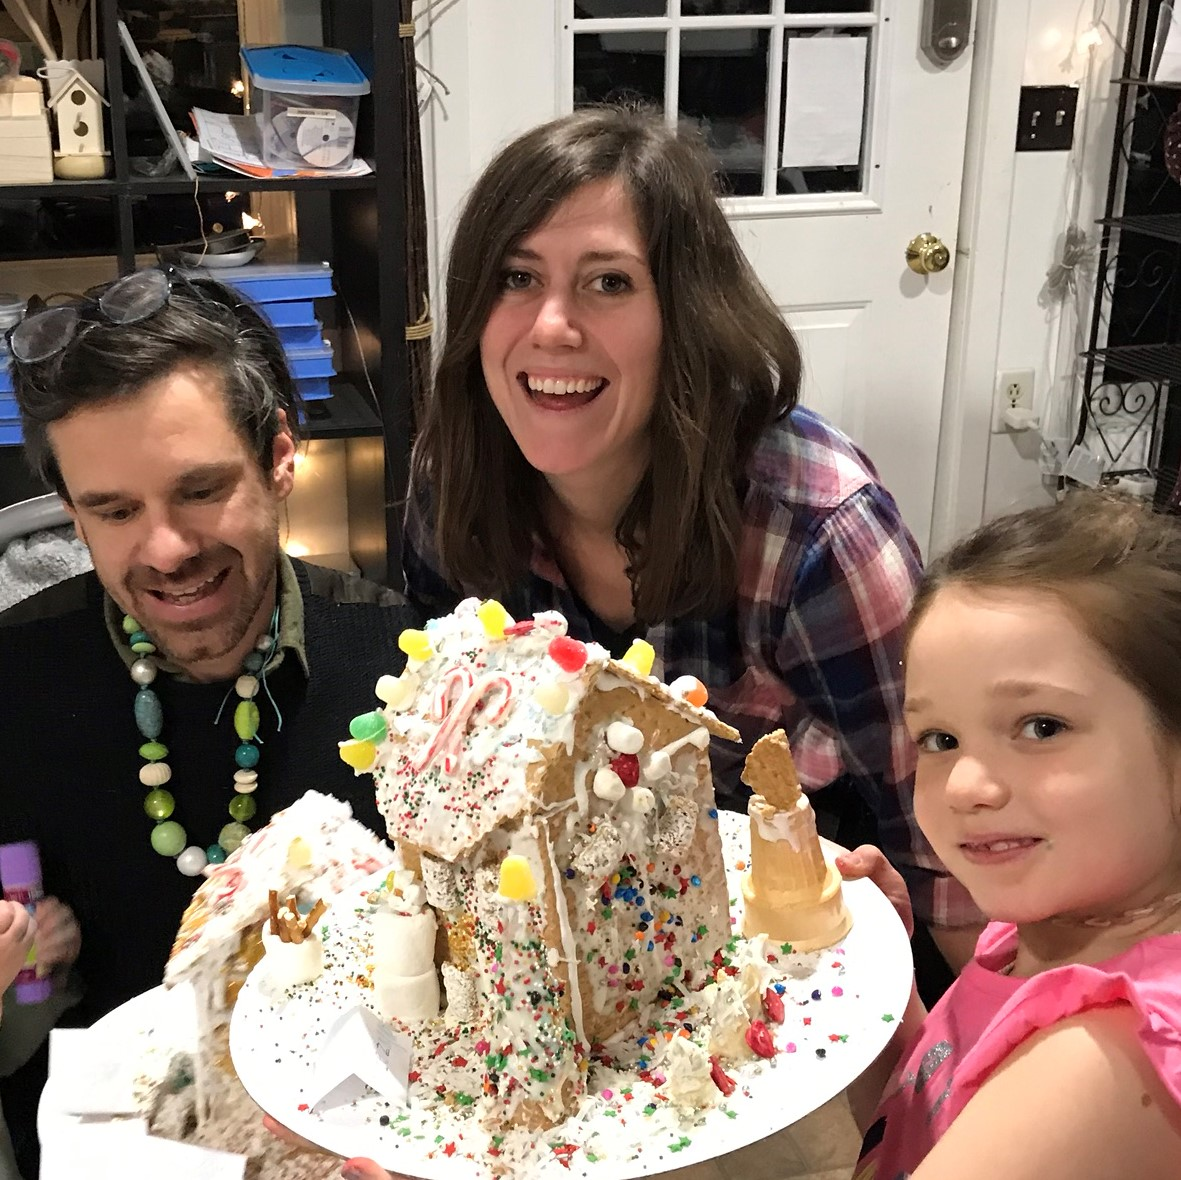 gingerbread house 5.jpeg